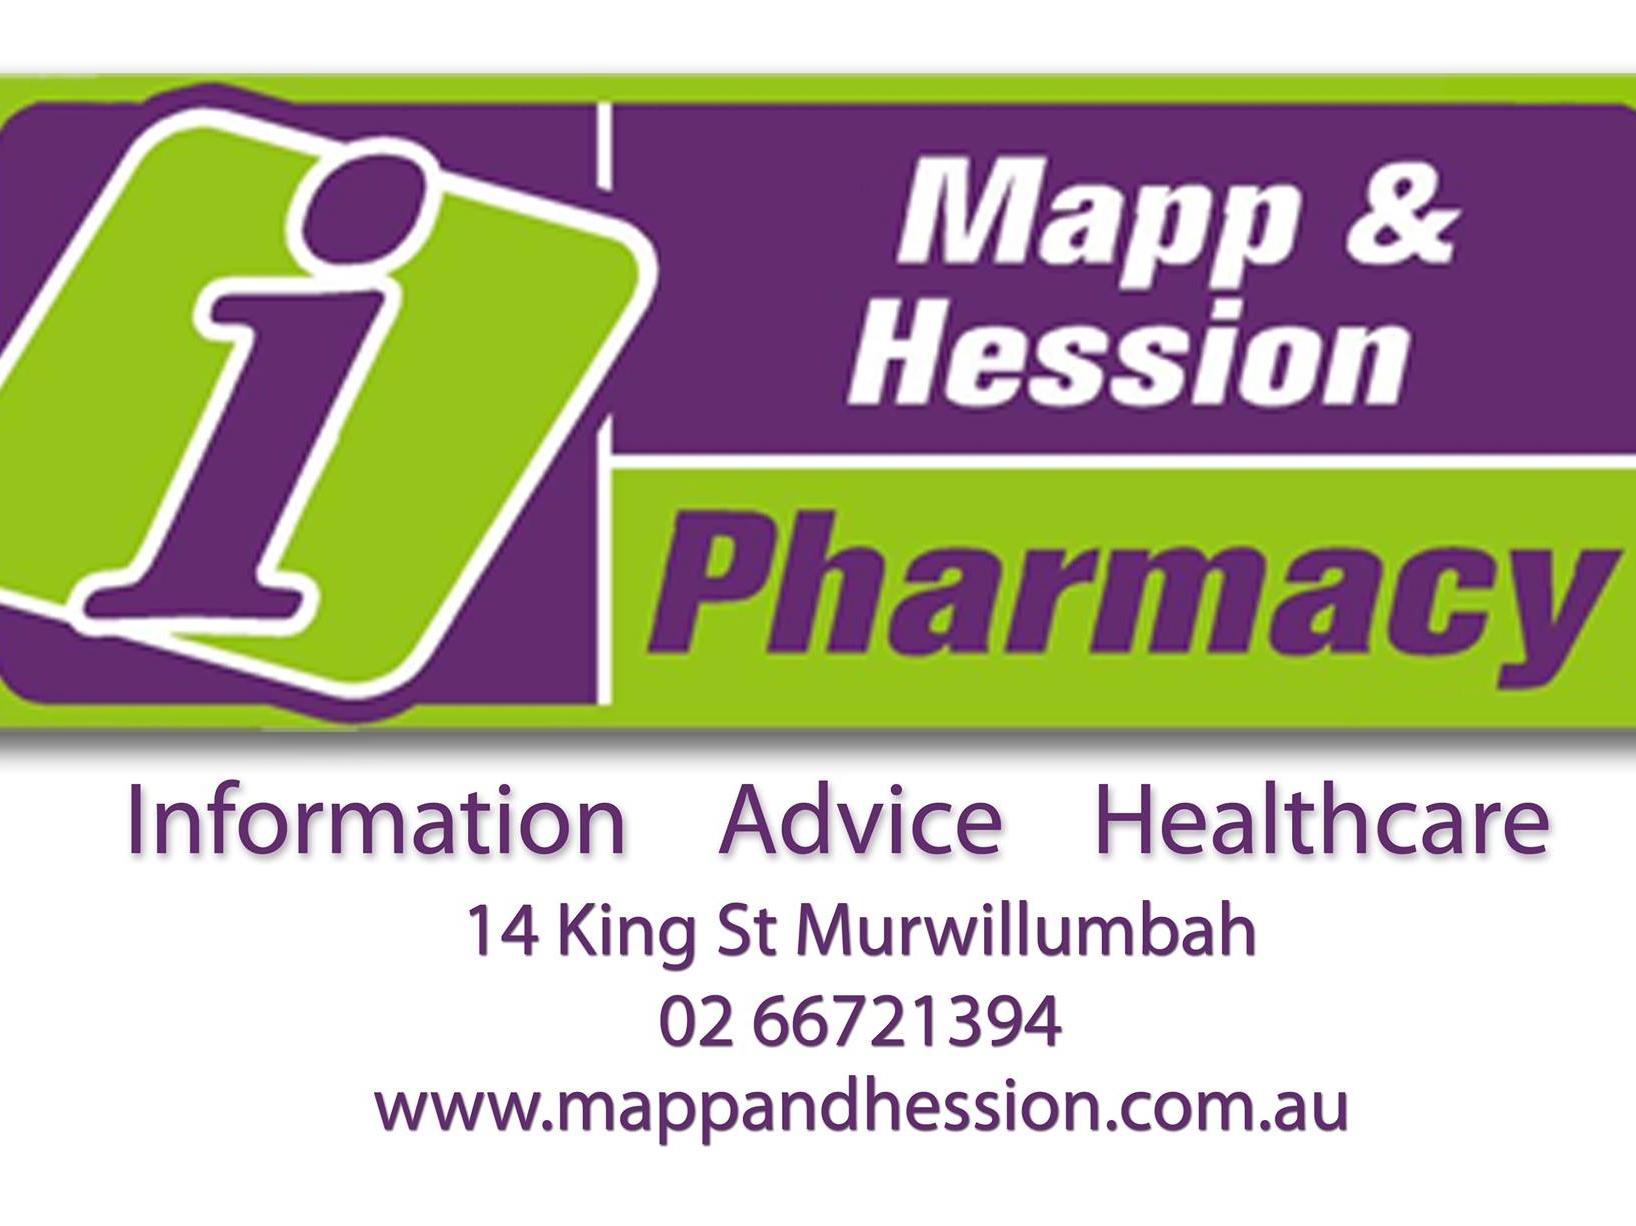 Greg Mapp & Paul Hession Pharmacy